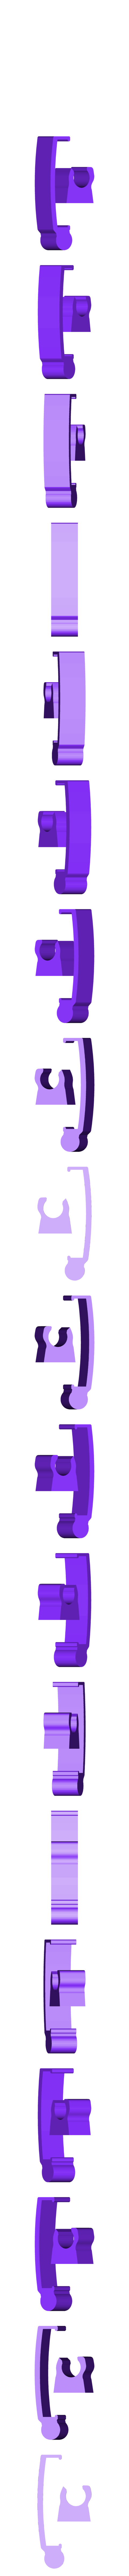 note_2_tripod_mount_v1.STL Download free STL file Note 2 w/ case Tripod Mount • 3D printer template, Jimmydelgadinho45